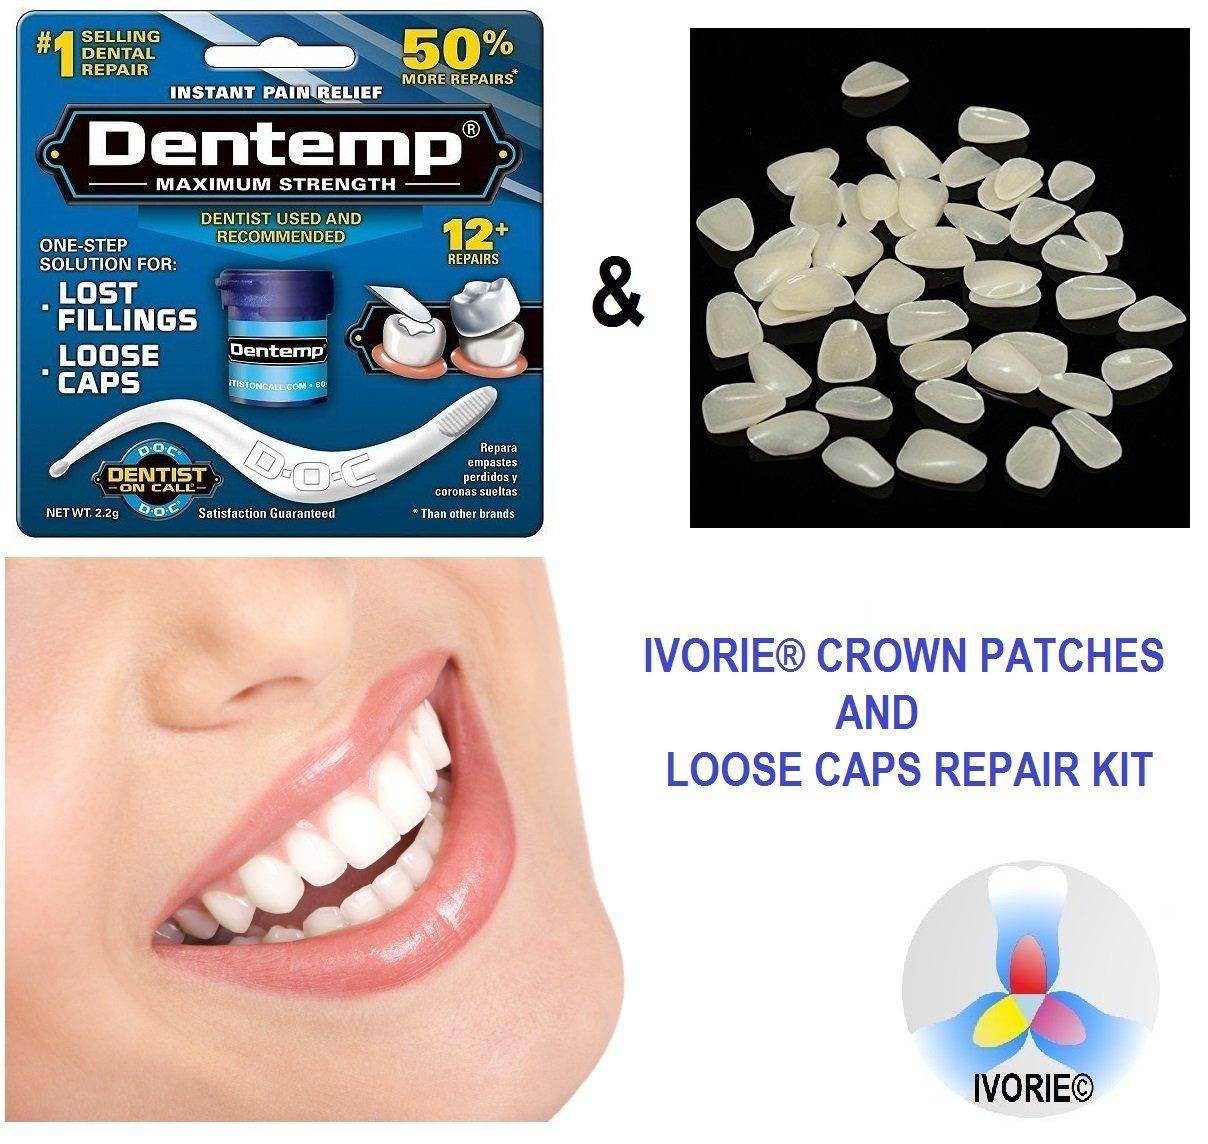 Dental Cosmetic Crown Patch Ultra-Thin Veneers & Dental Adhesive Glue Bond Home Use (Shade A2)